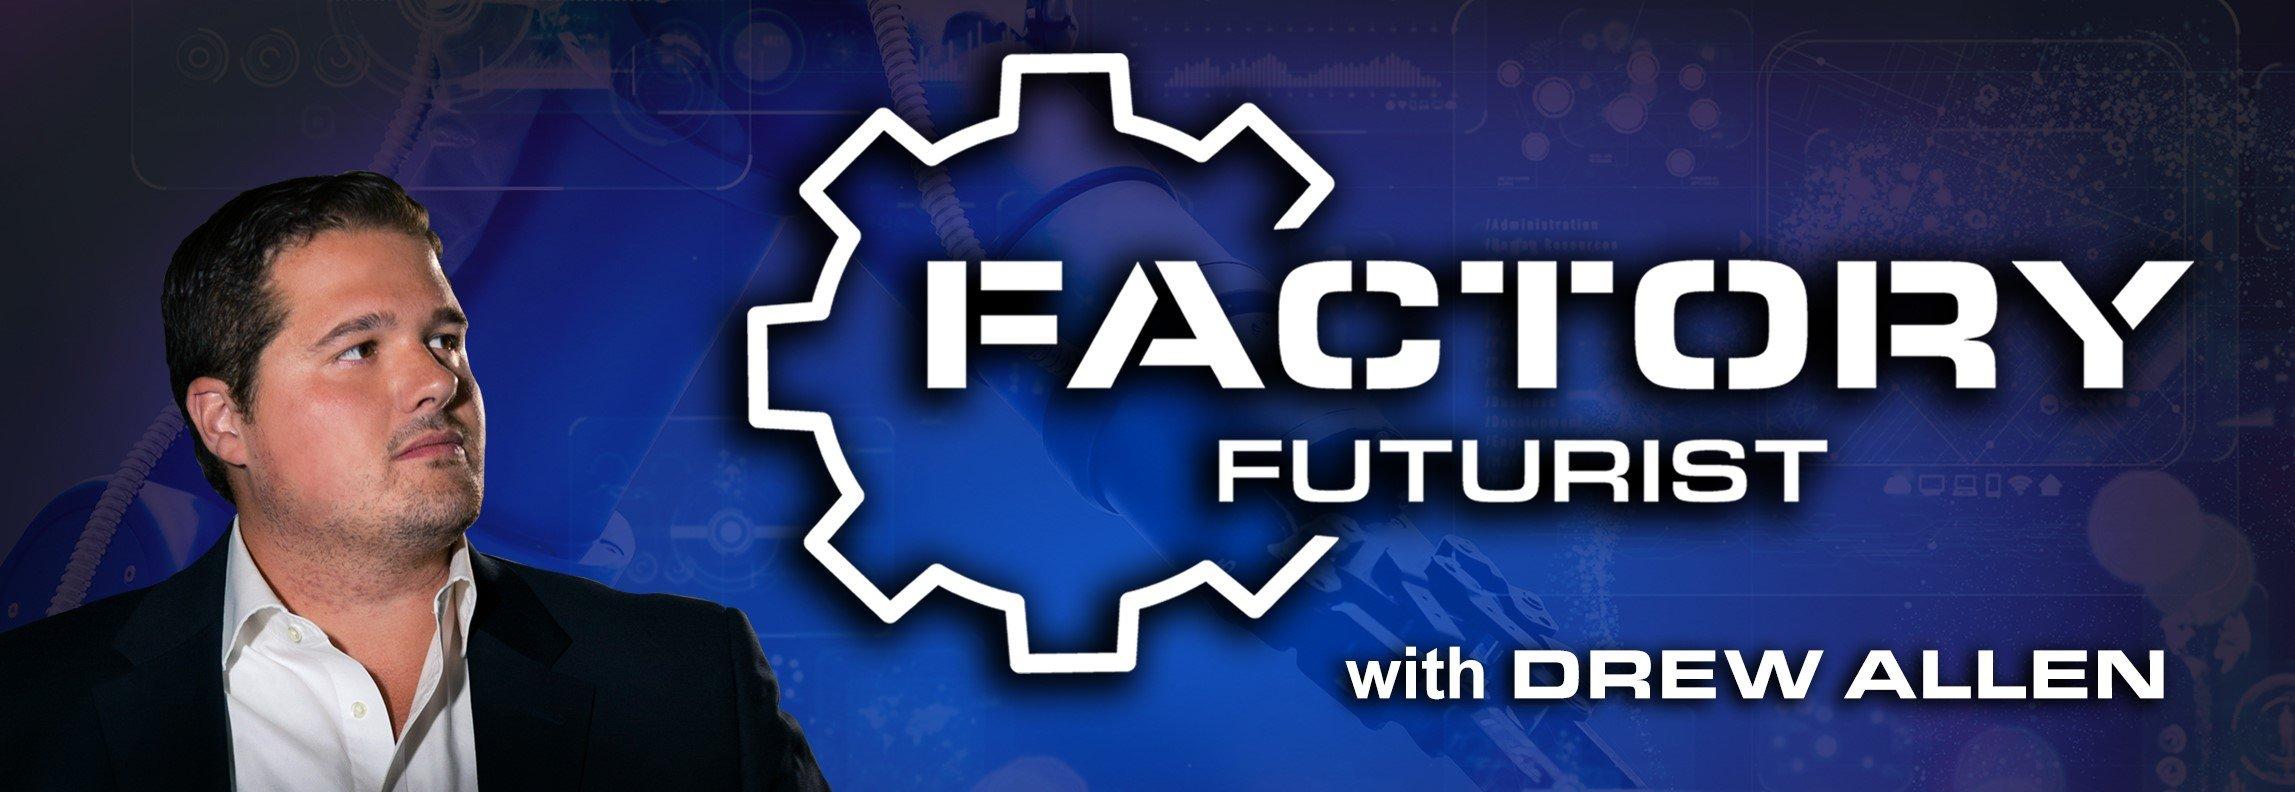 factory_futurist_social_ad_1